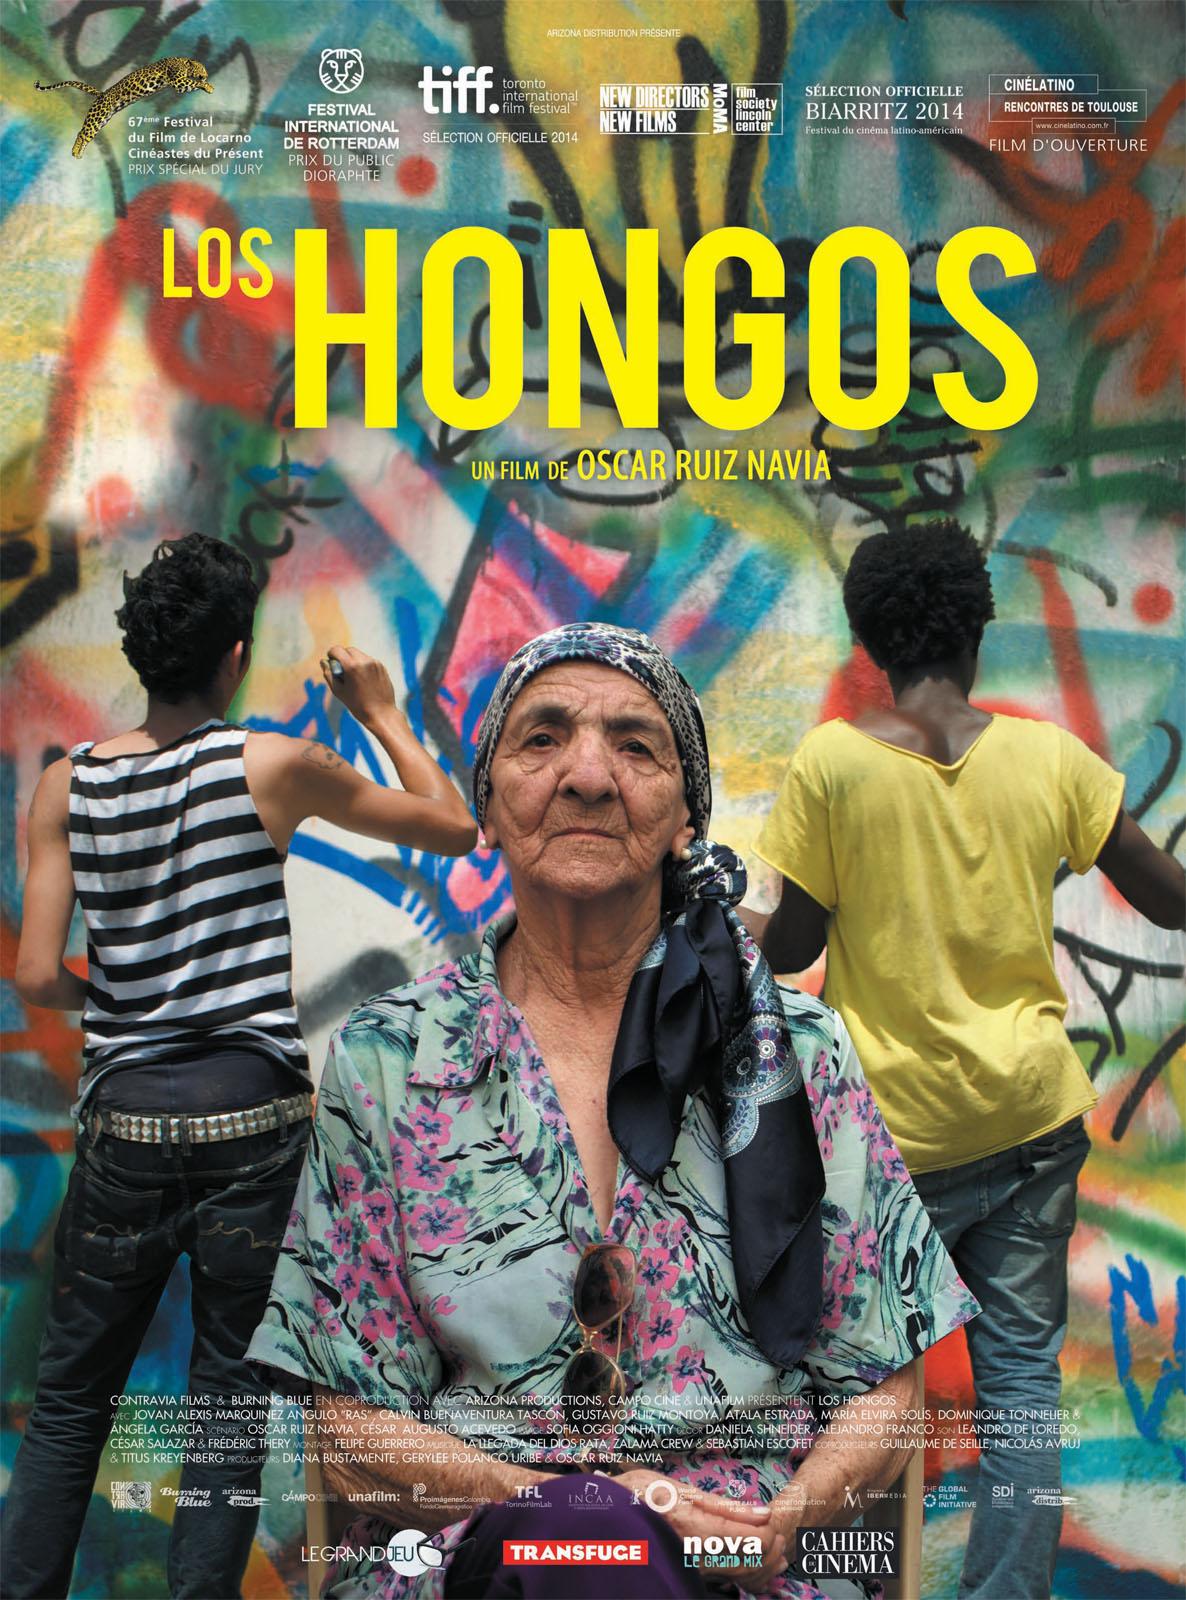 Los hongos Streaming HD Web-DL